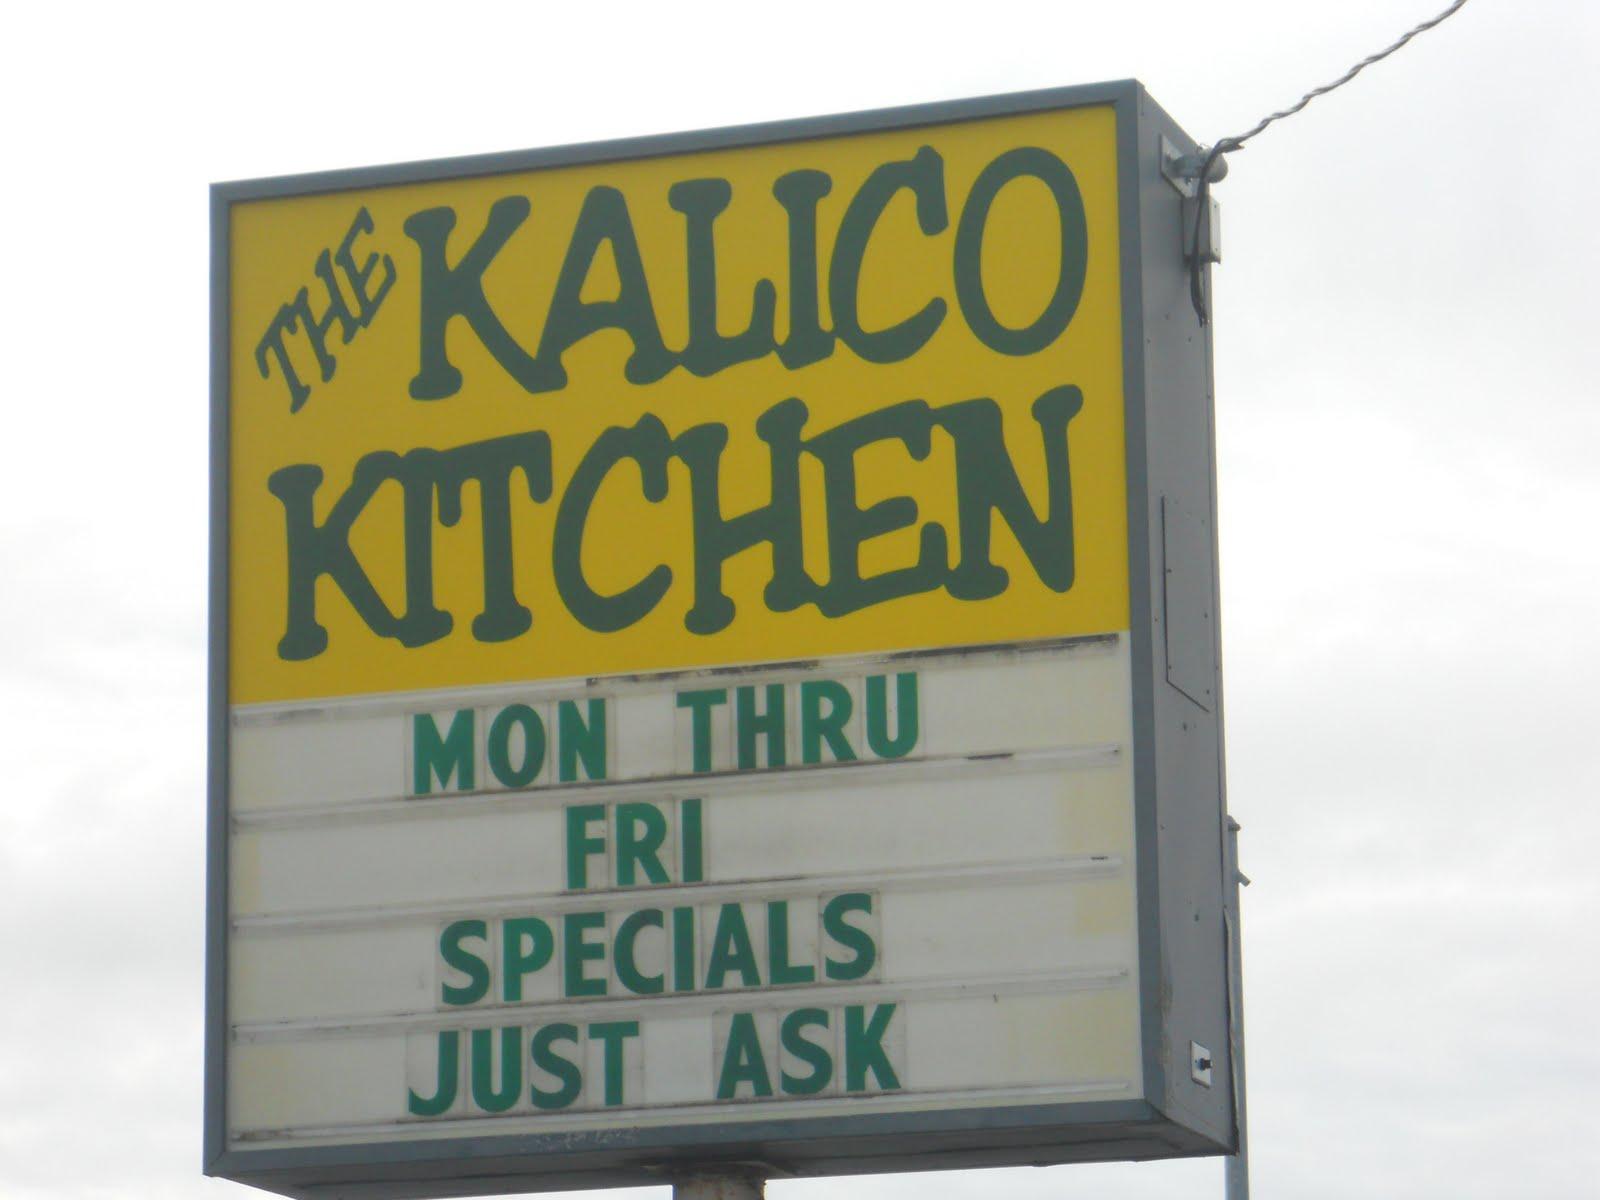 Tasty Trek: Kalico Kitchen